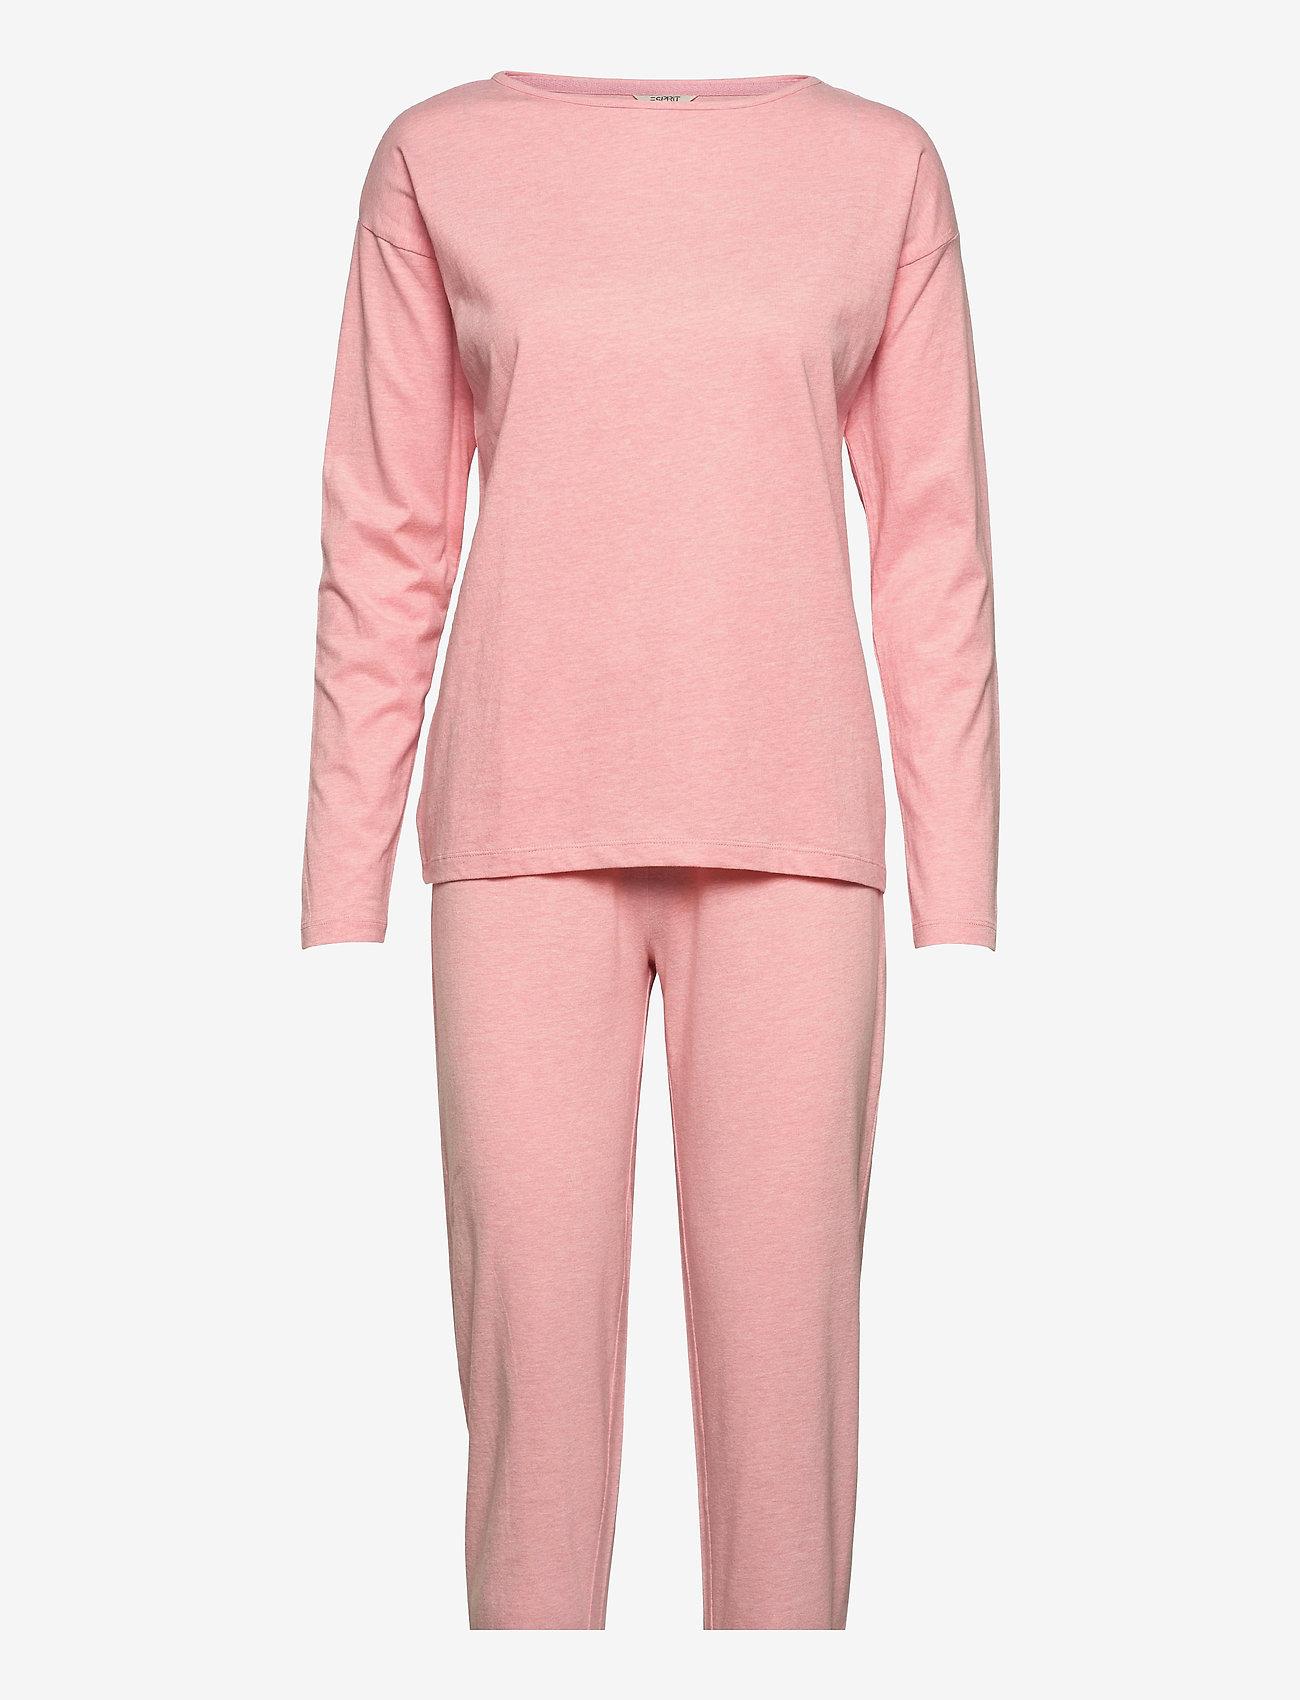 Esprit Bodywear Women - Pyjamas - pyjama''s - coral - 0